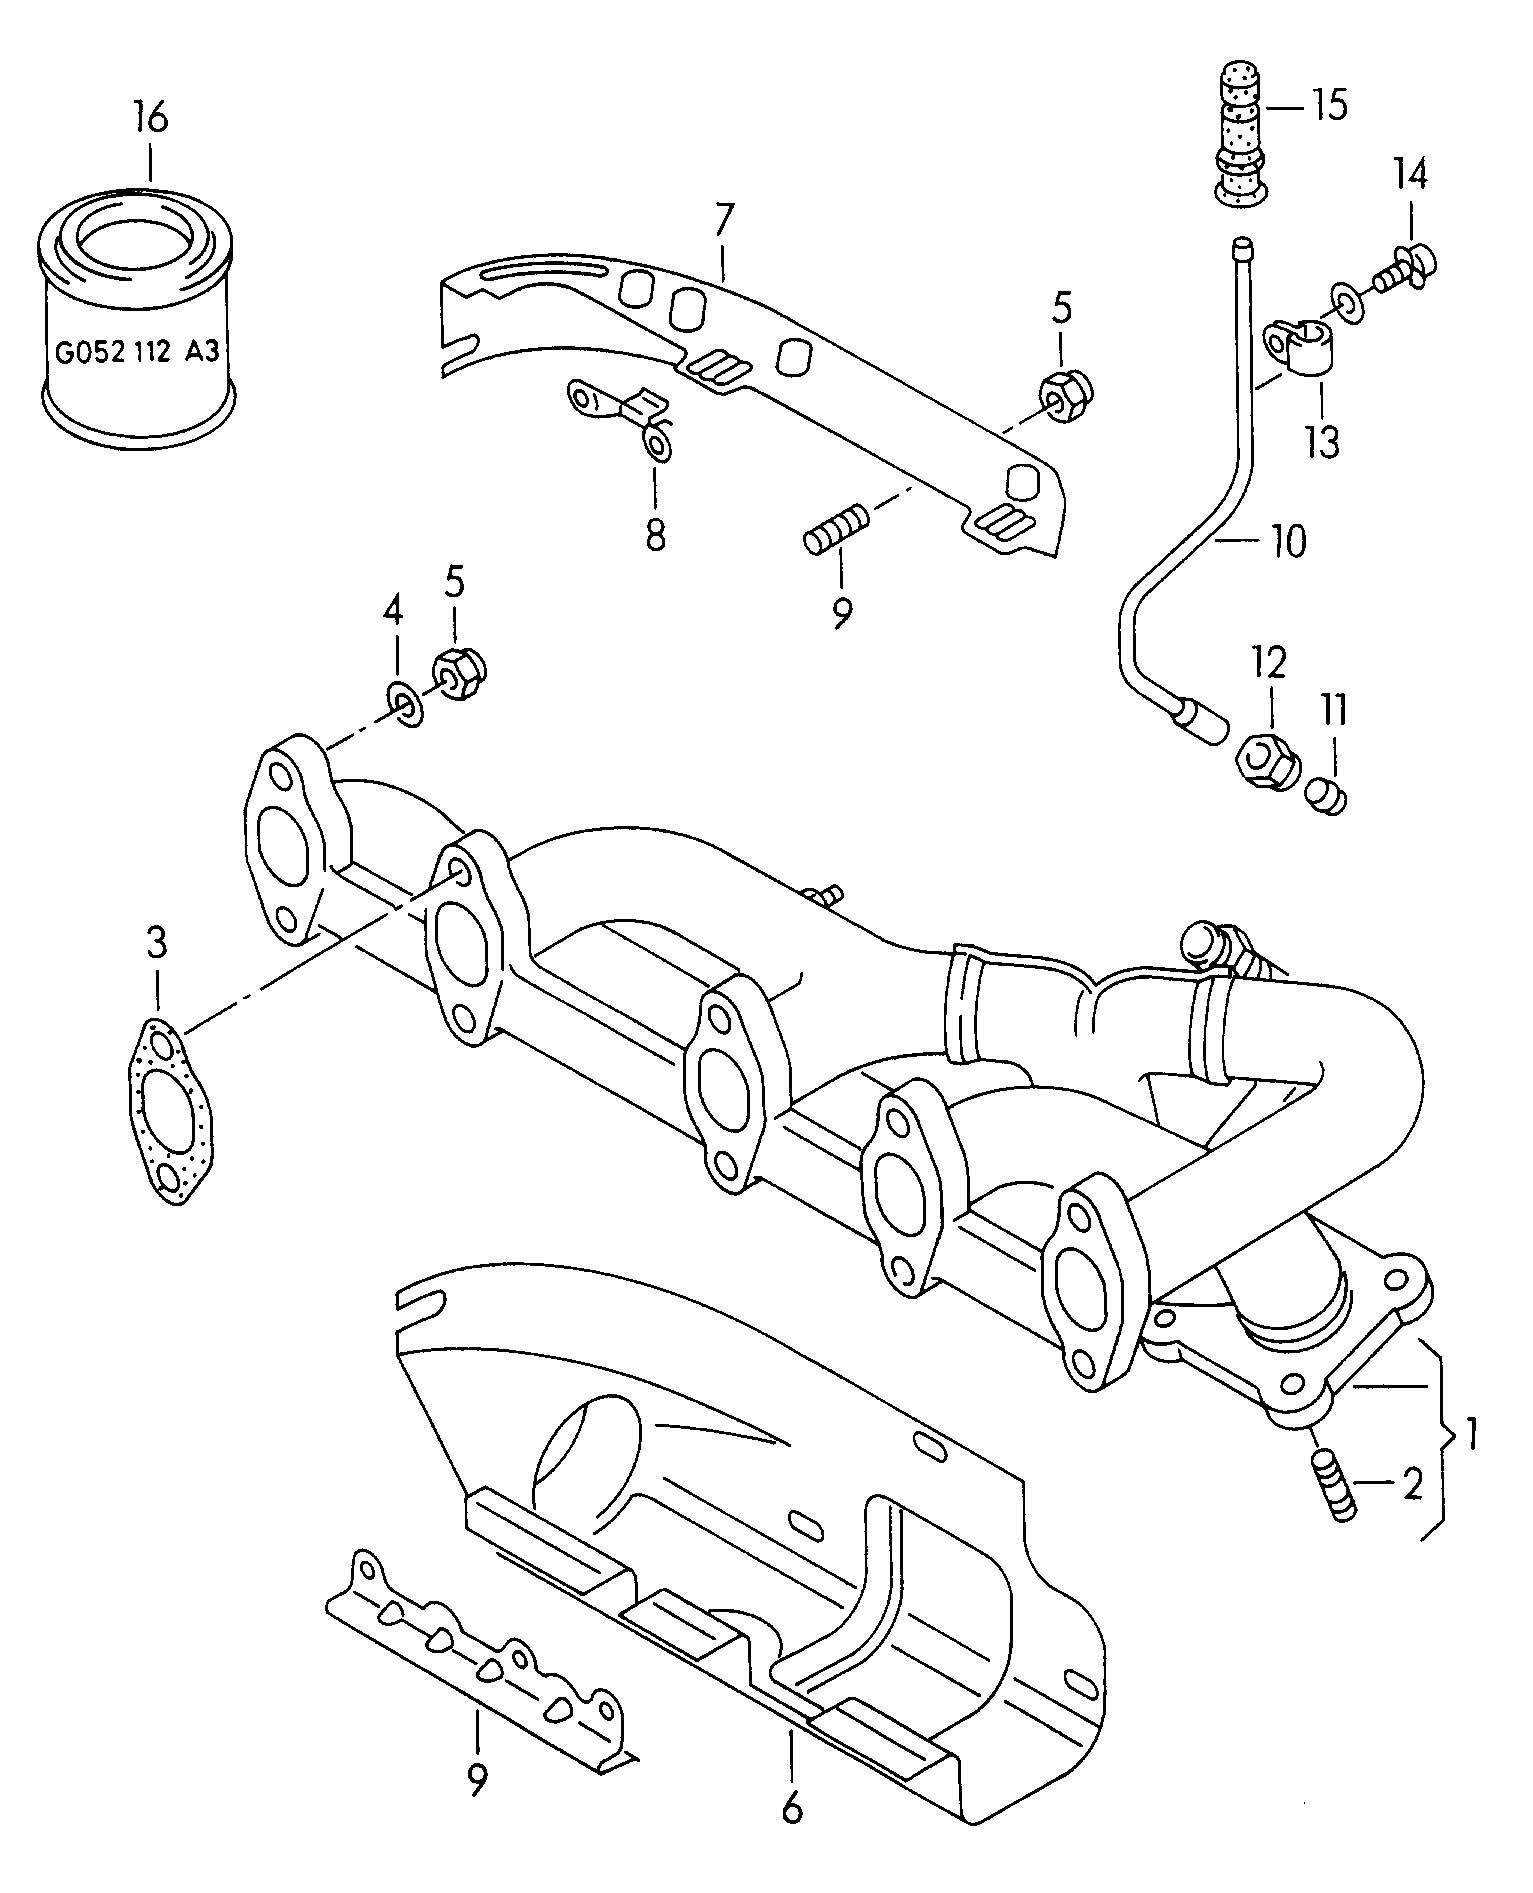 2002 isuzu rodeo engine diagram towbar electrics wiring trooper exhaust system imageresizertool com